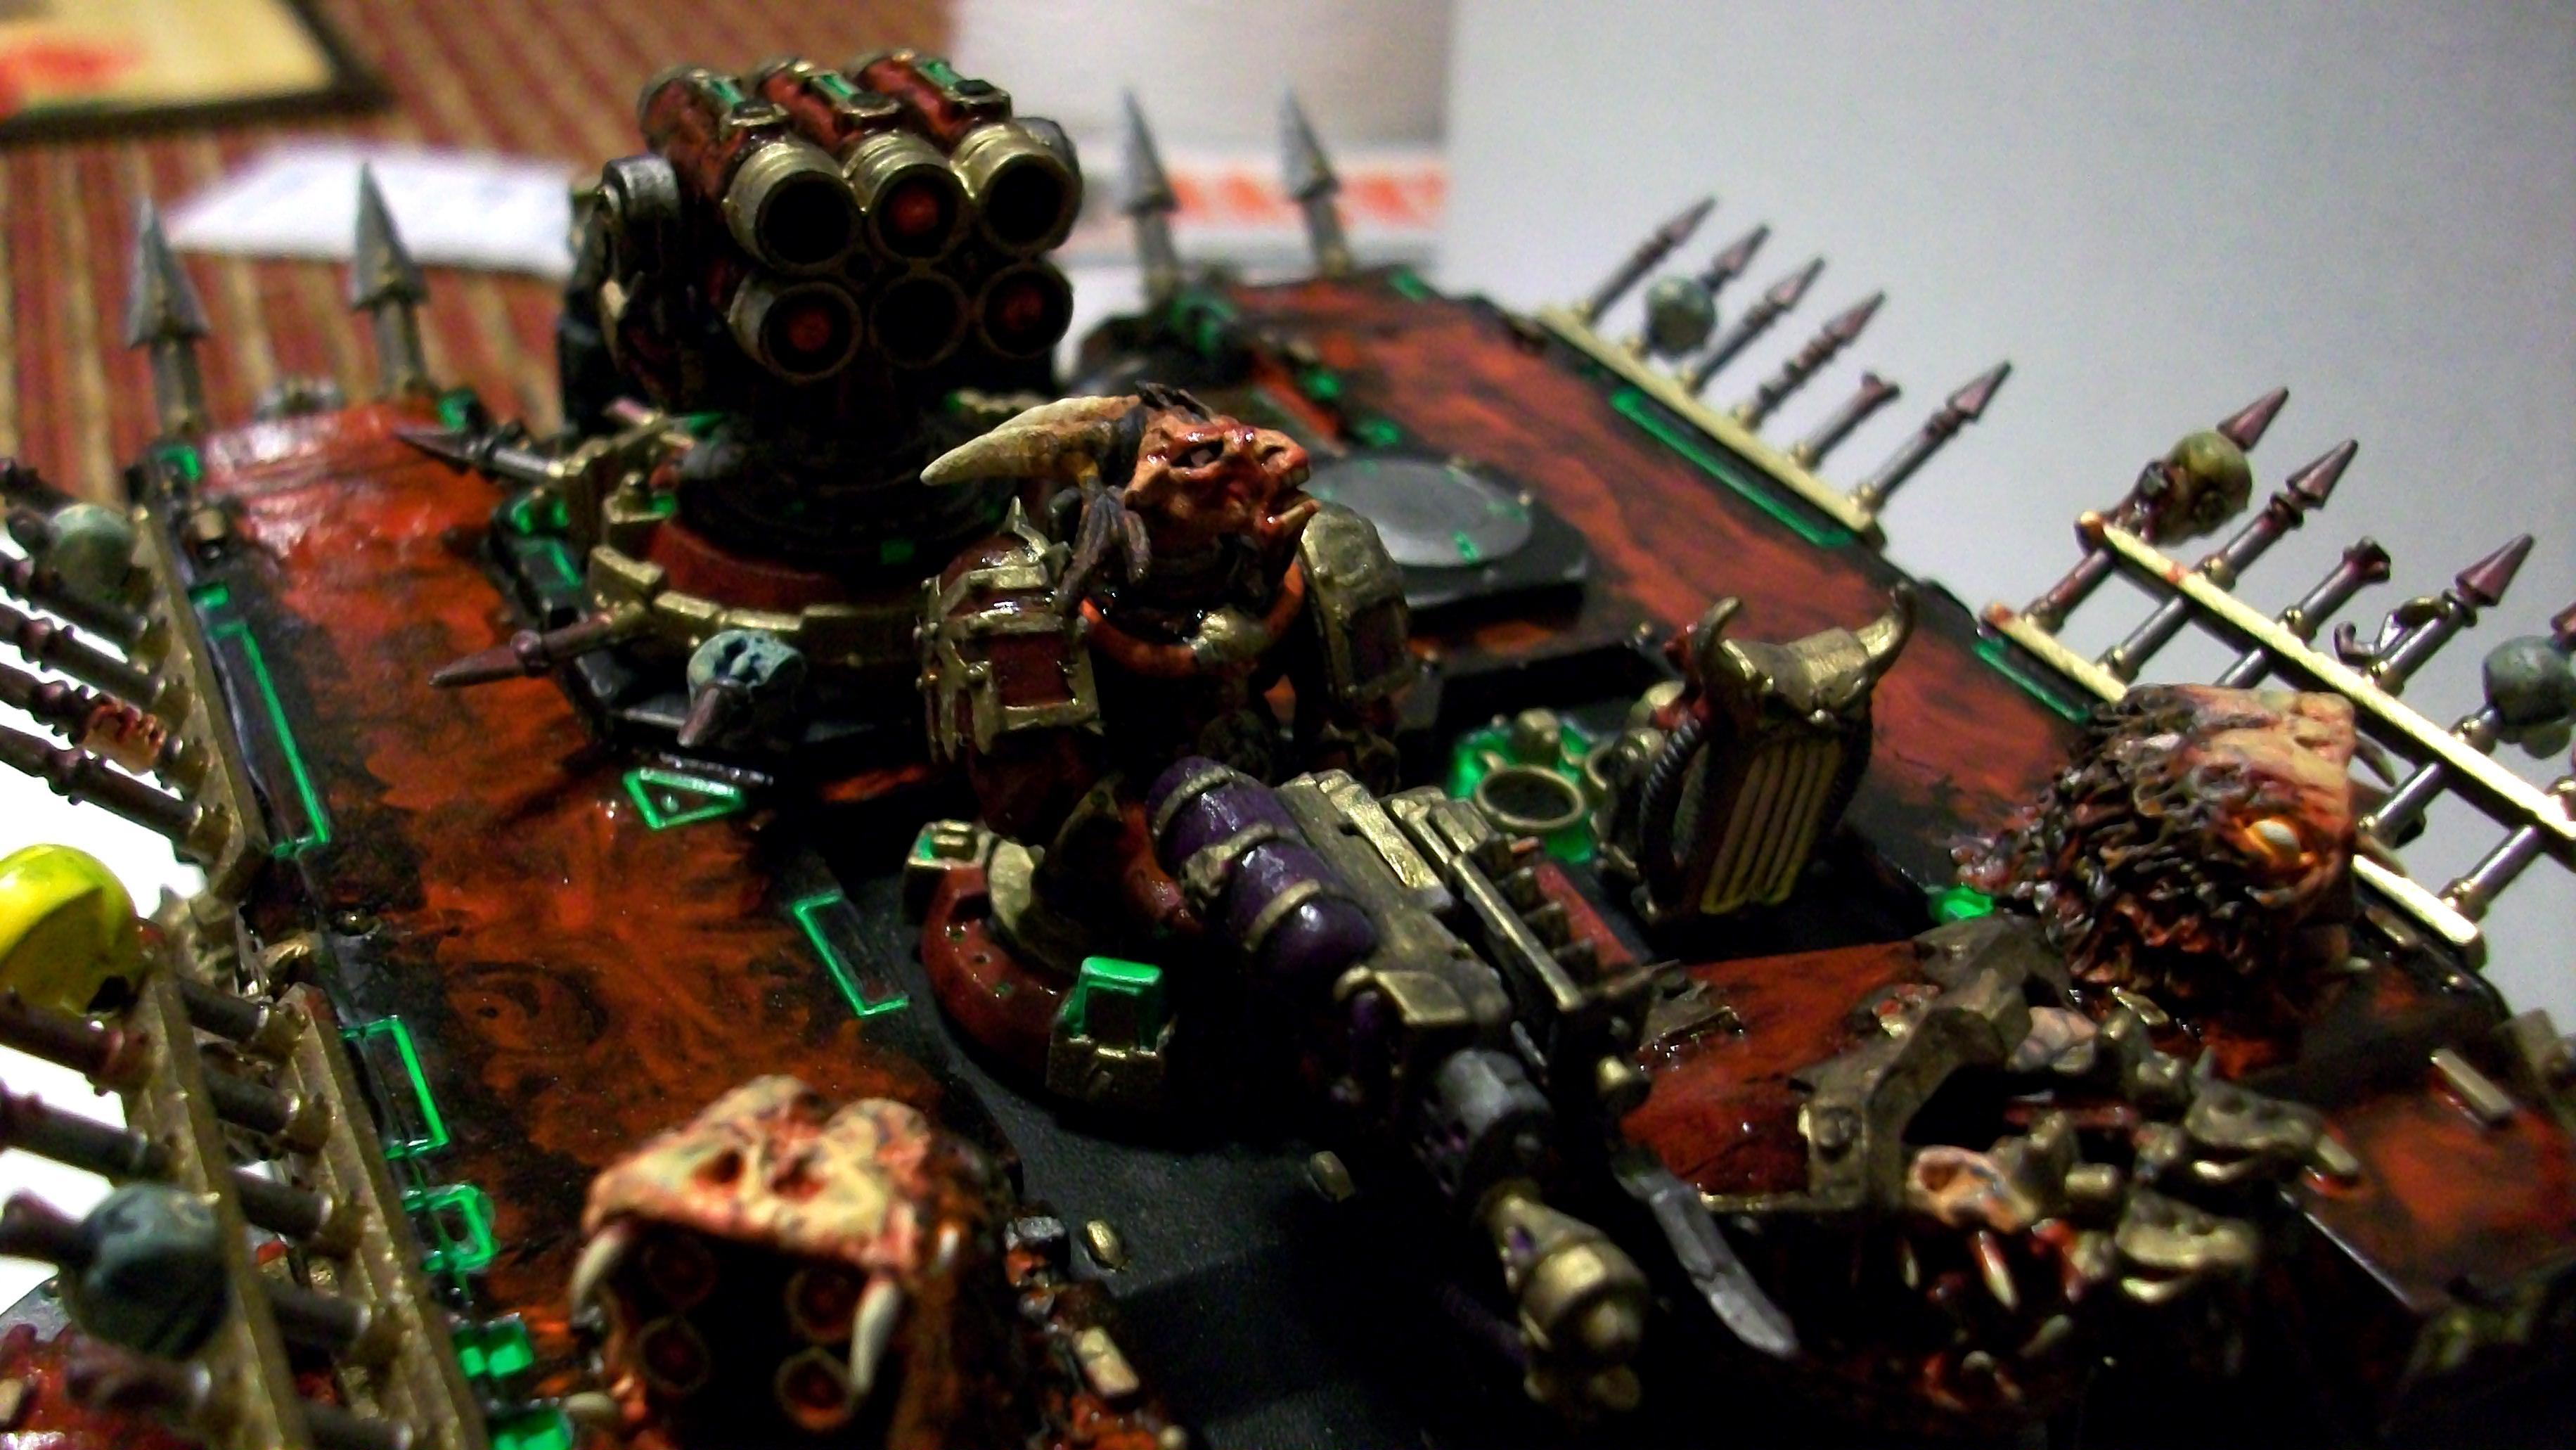 Assault, Chaos, Custom, Greens Stuff, Khorne, Land Raider, Lascannon, Nurgle, Possessed, Slaanesh, Space Marines, Terminator Armor, Transport, Tzeentch, Vehicle